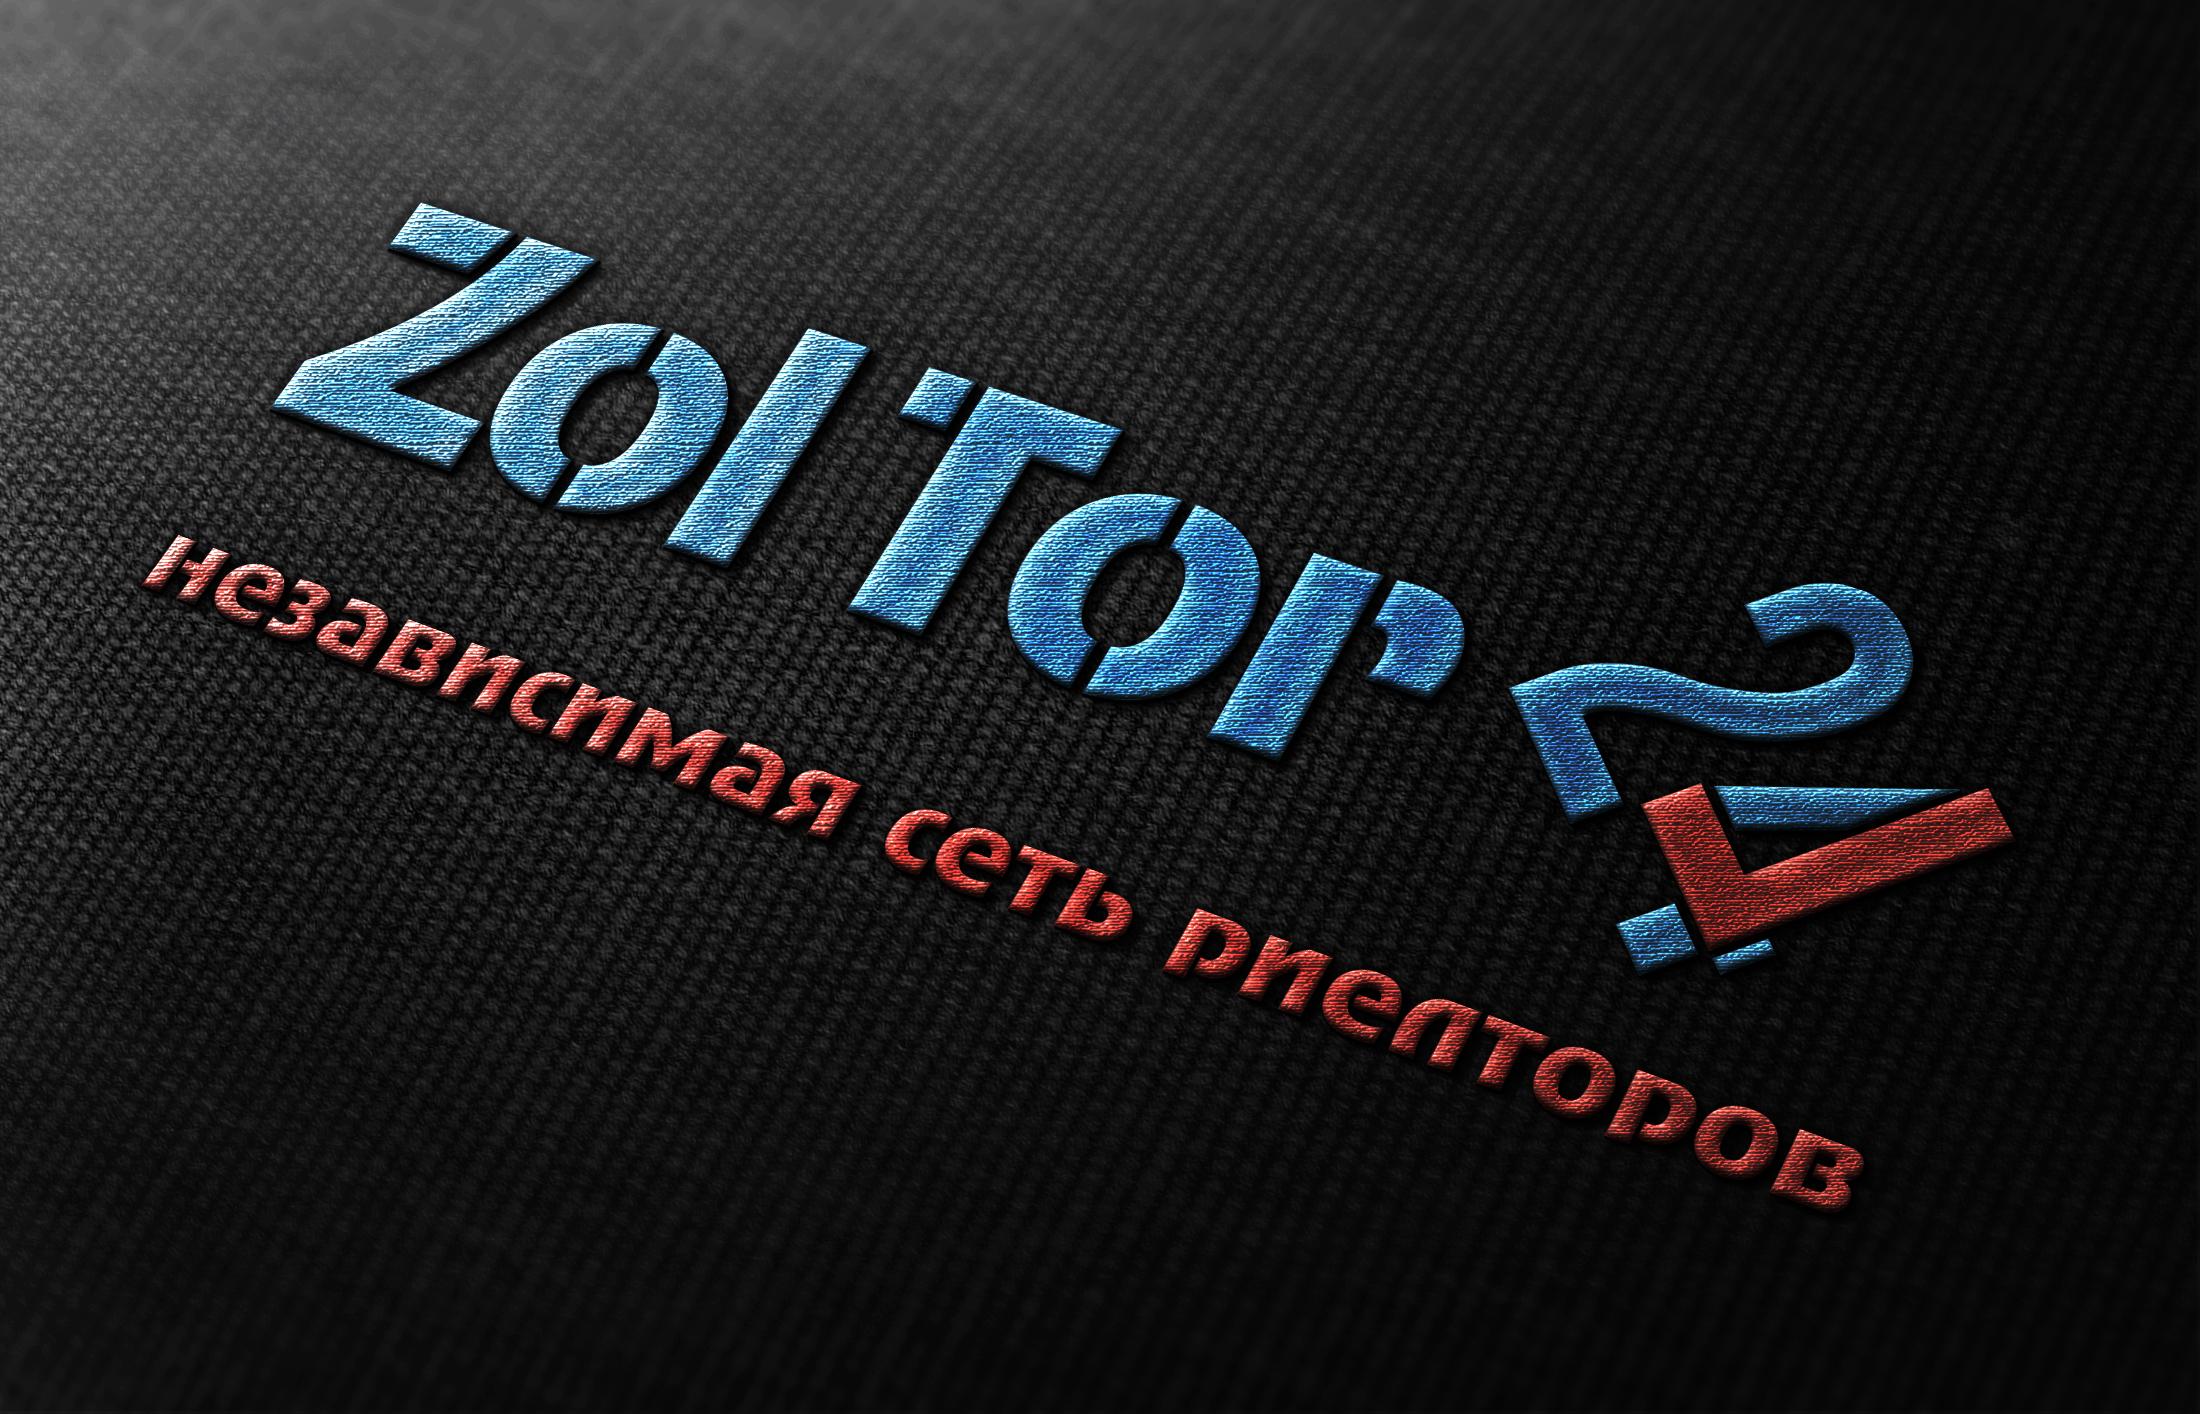 Логотип и фирменный стиль ZolTor24 фото f_4185c89825f5226c.jpg